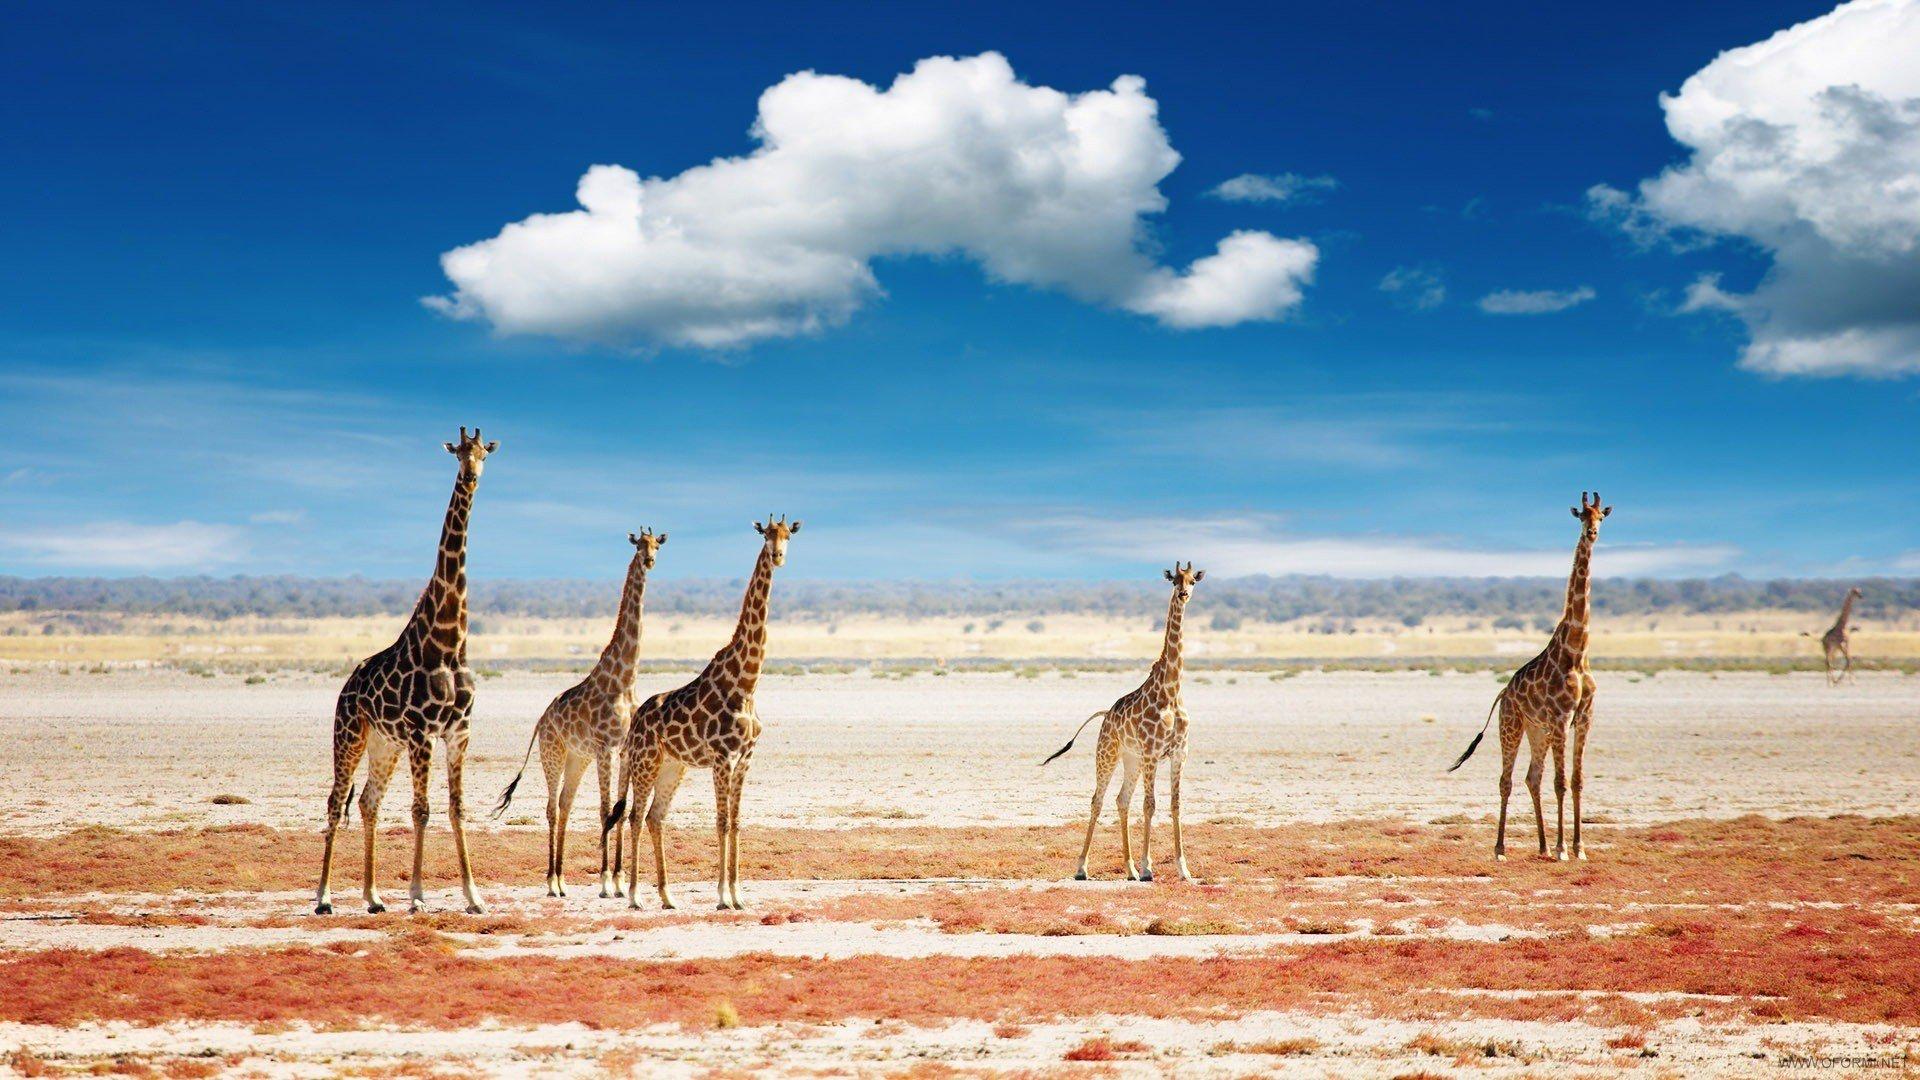 African safari animals wallpaper